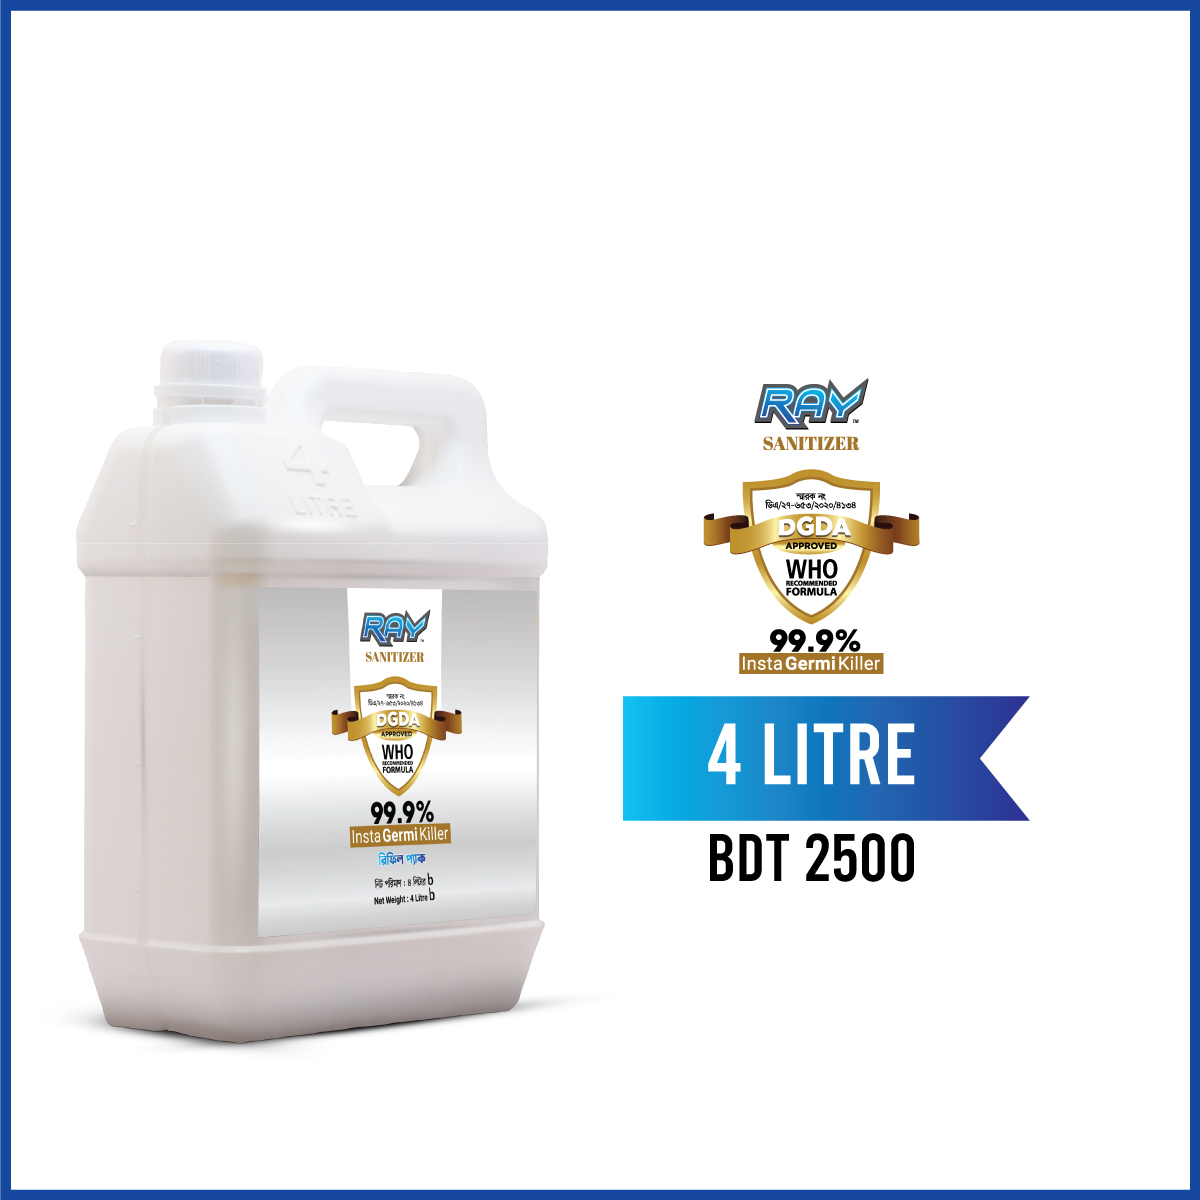 RAY Sanitizer Refill Blue 4 Liter